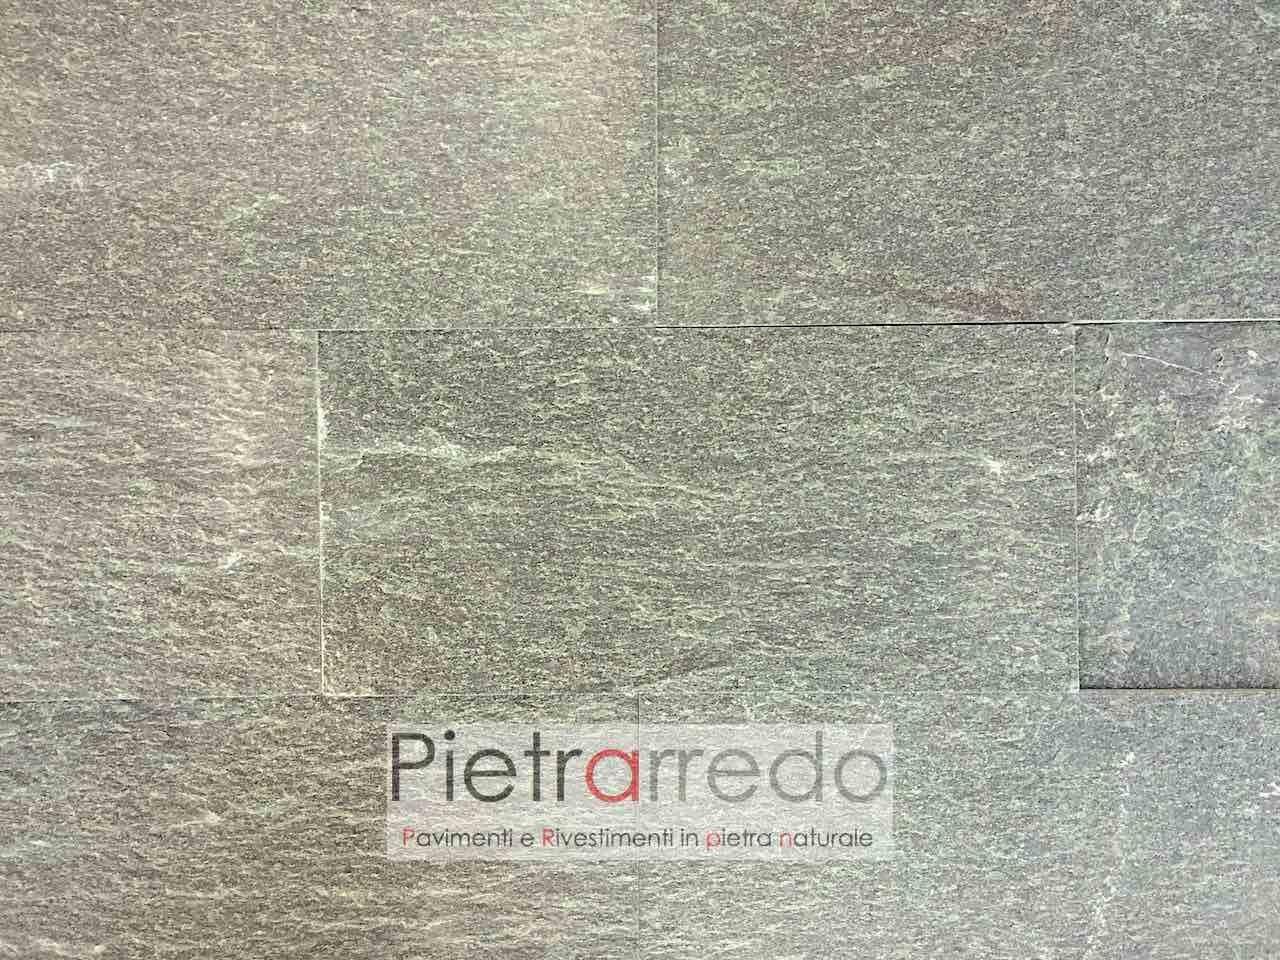 Pietra Verde Rivestimento : Rivestimento pietra serpentino verde 50% offerta prezzo u20ac 39 mq